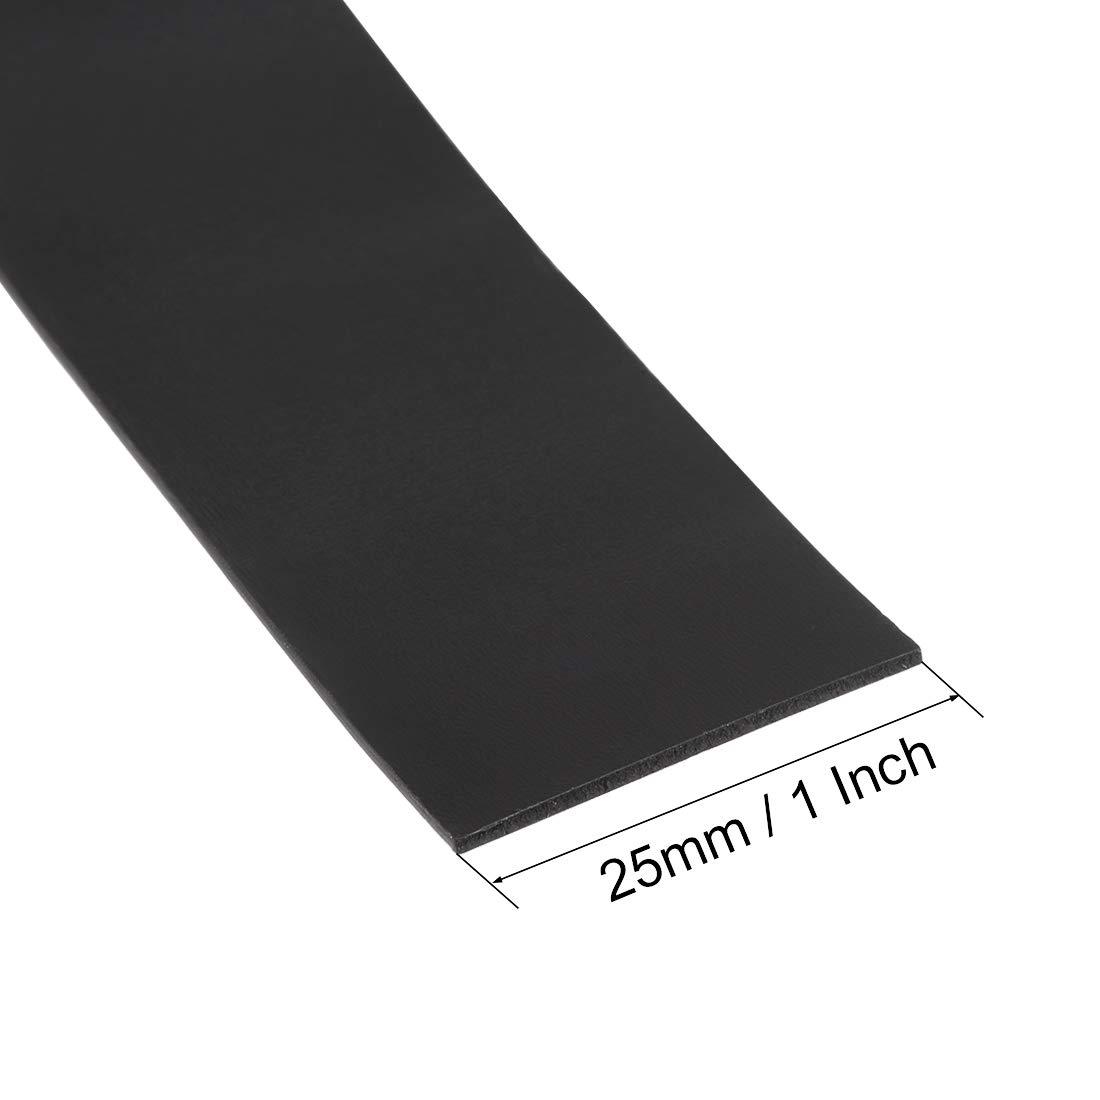 Sourcing Map Bande magn/étique avec ruban adh/ésif blanc 7,6 x 9,9 x 1,6 cm